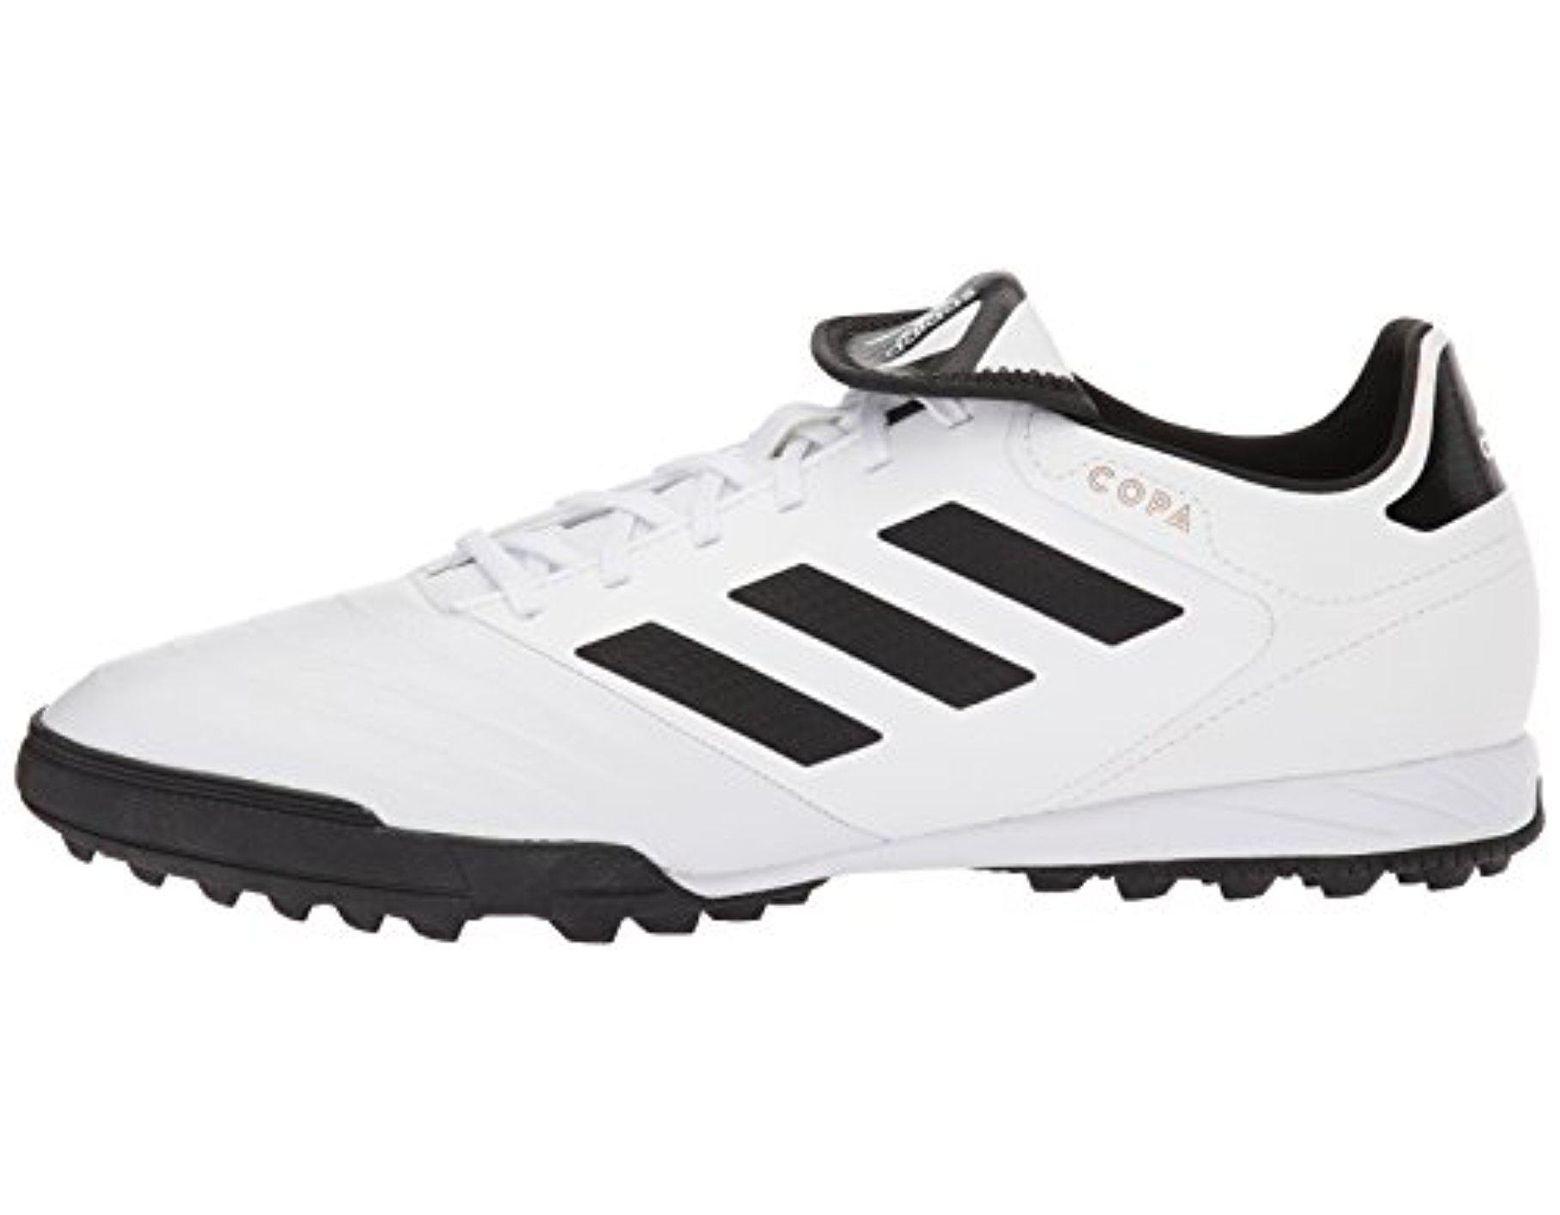 fe220ca368 adidas Originals Adidas Copa Tango 18.3 Tf Soccer Shoe in White for Men -  Lyst